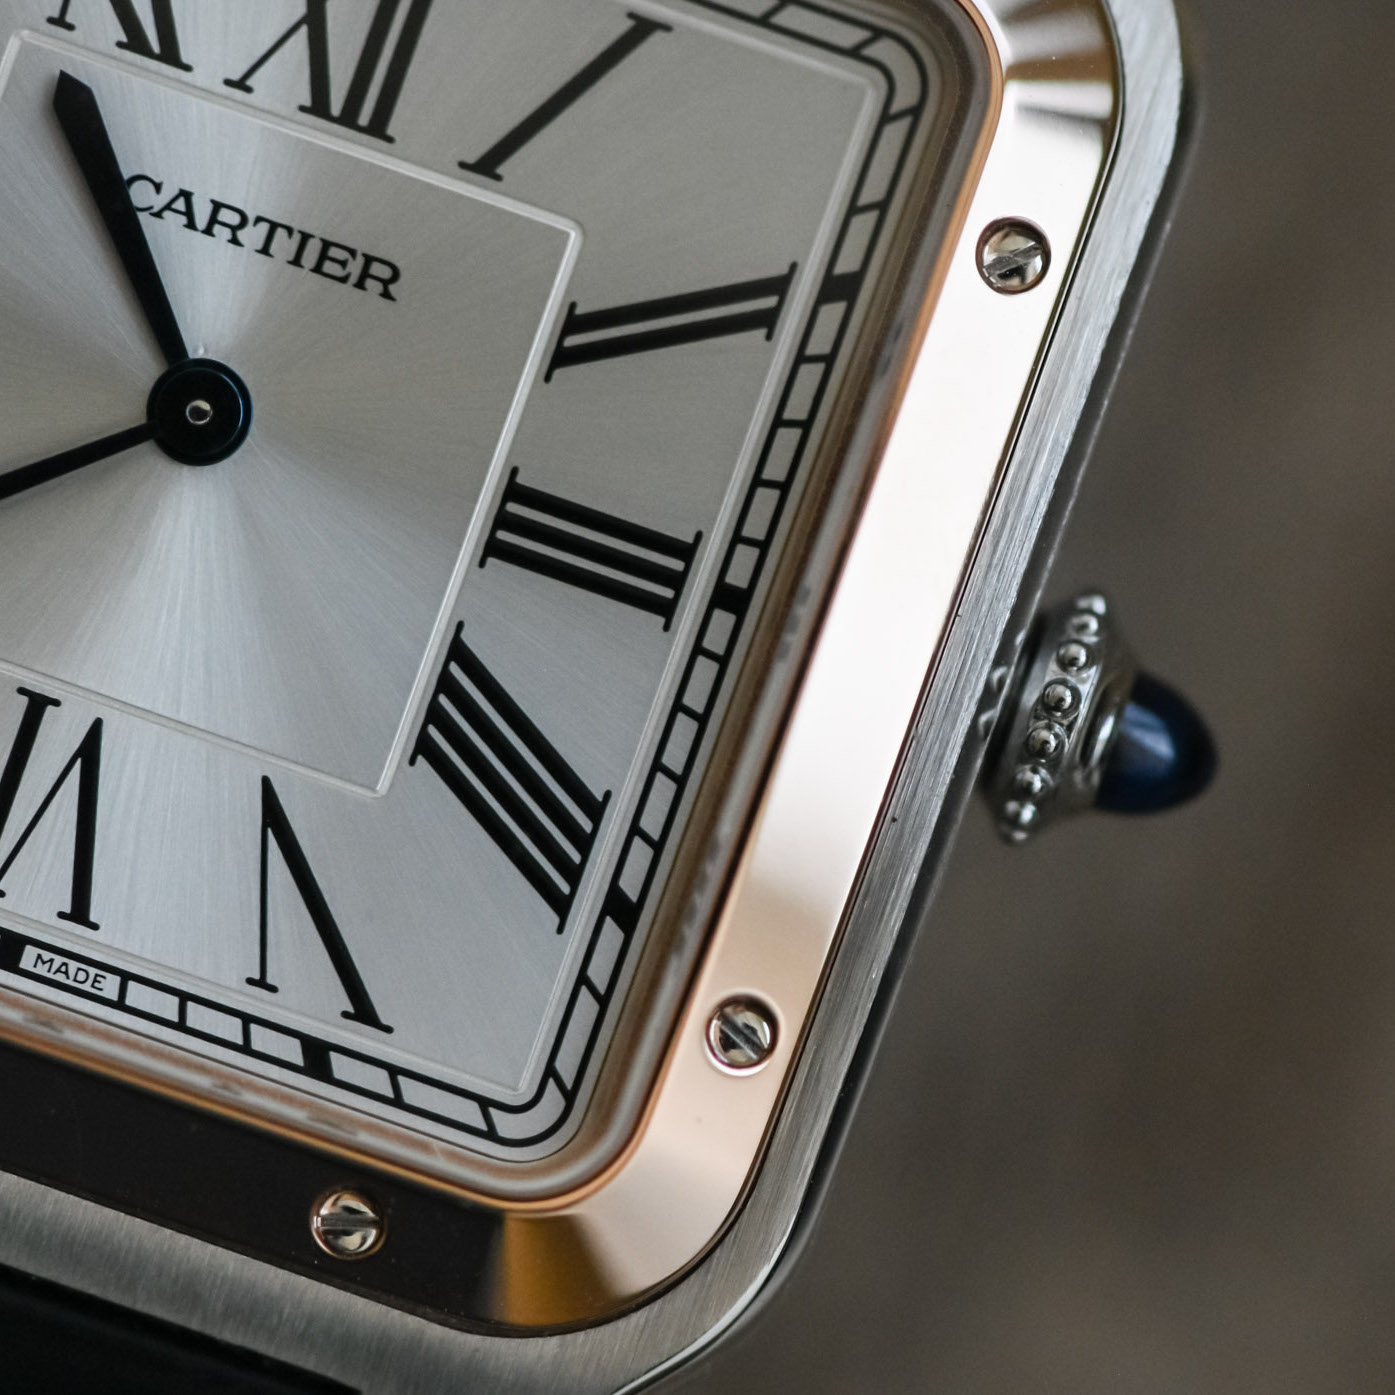 2020-Cartier-Santos-Dumont-XL-Hand-Wind-review-19